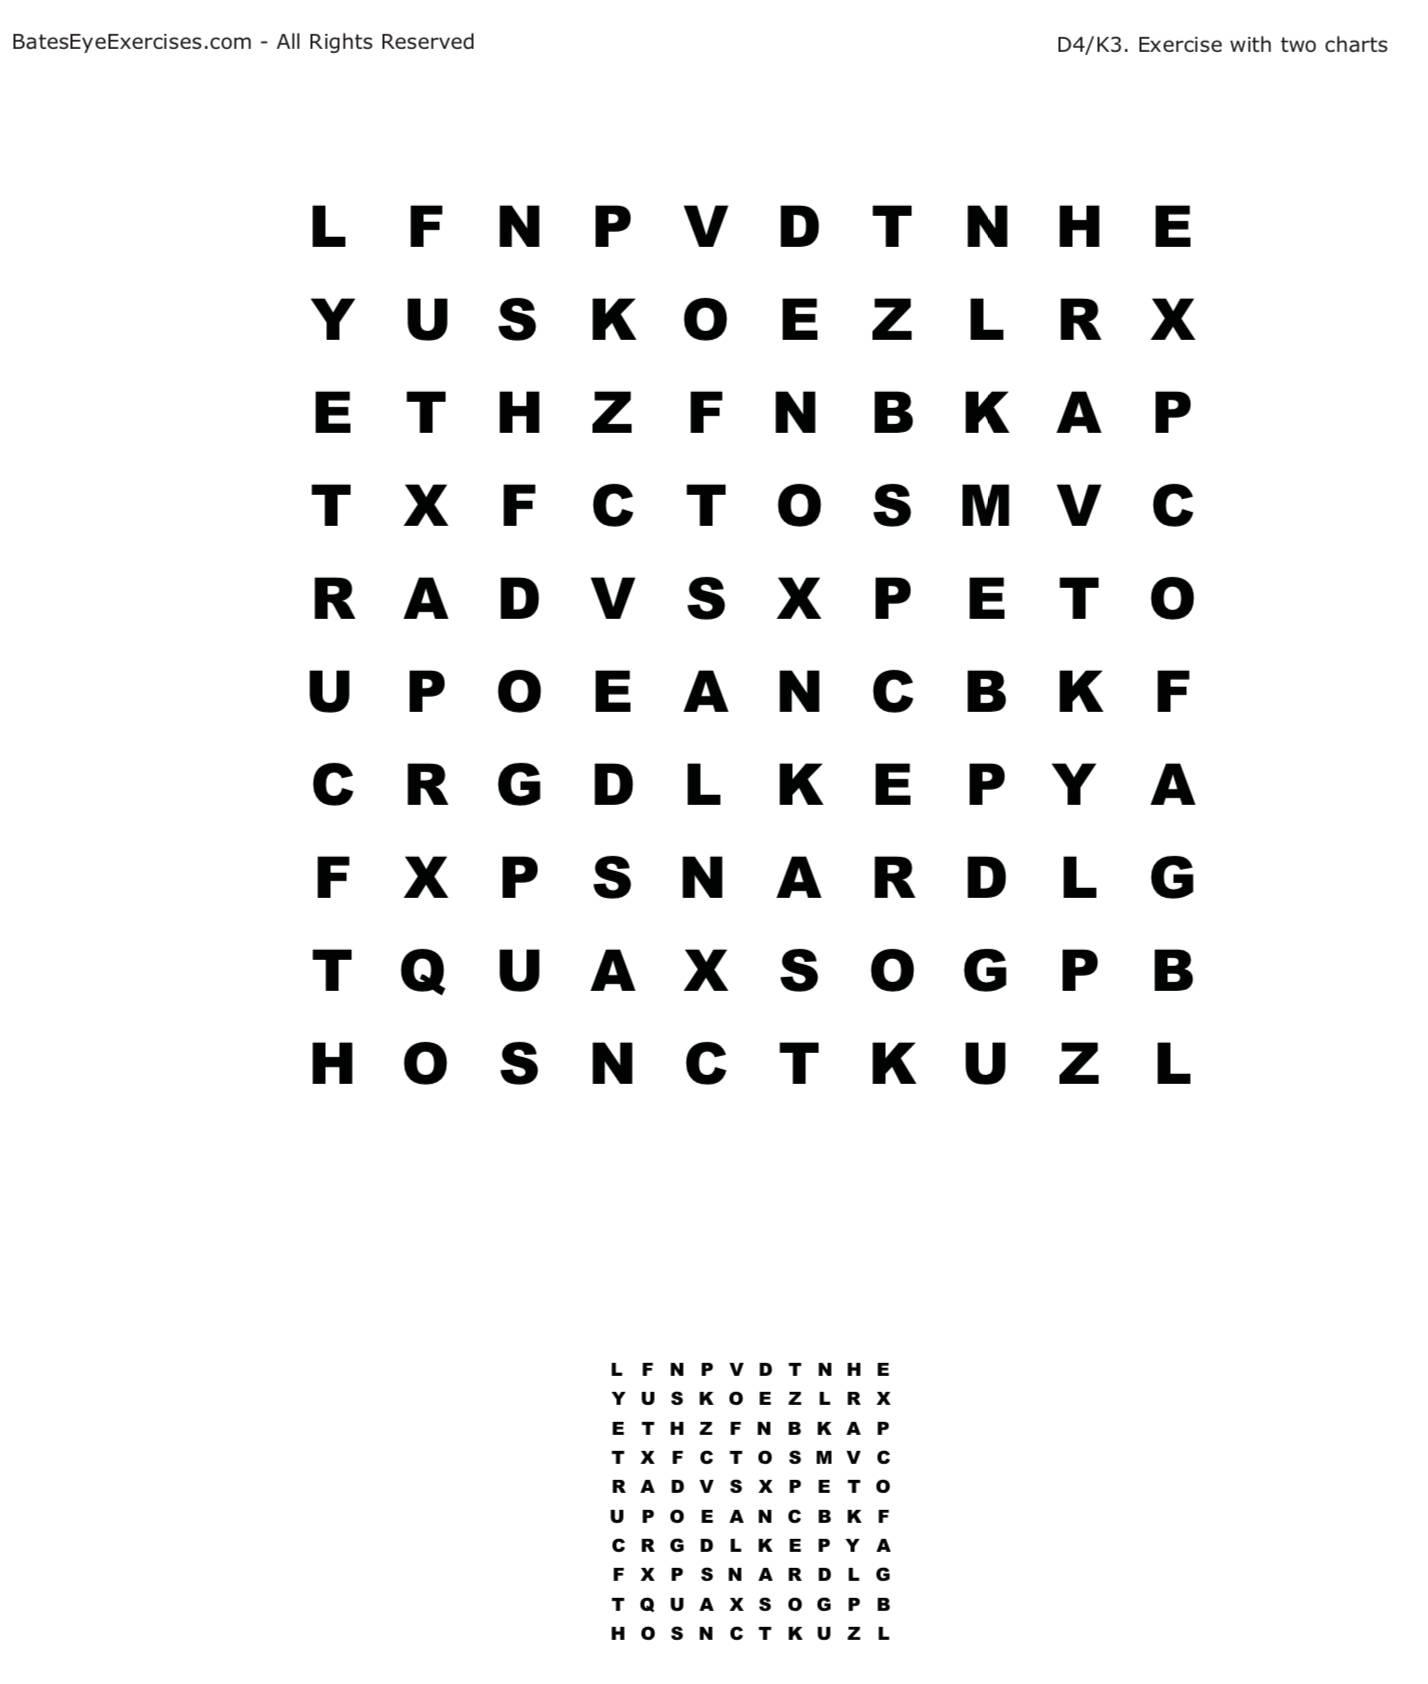 Bateseyeexercises myopia exercises download the chart nvjuhfo Images